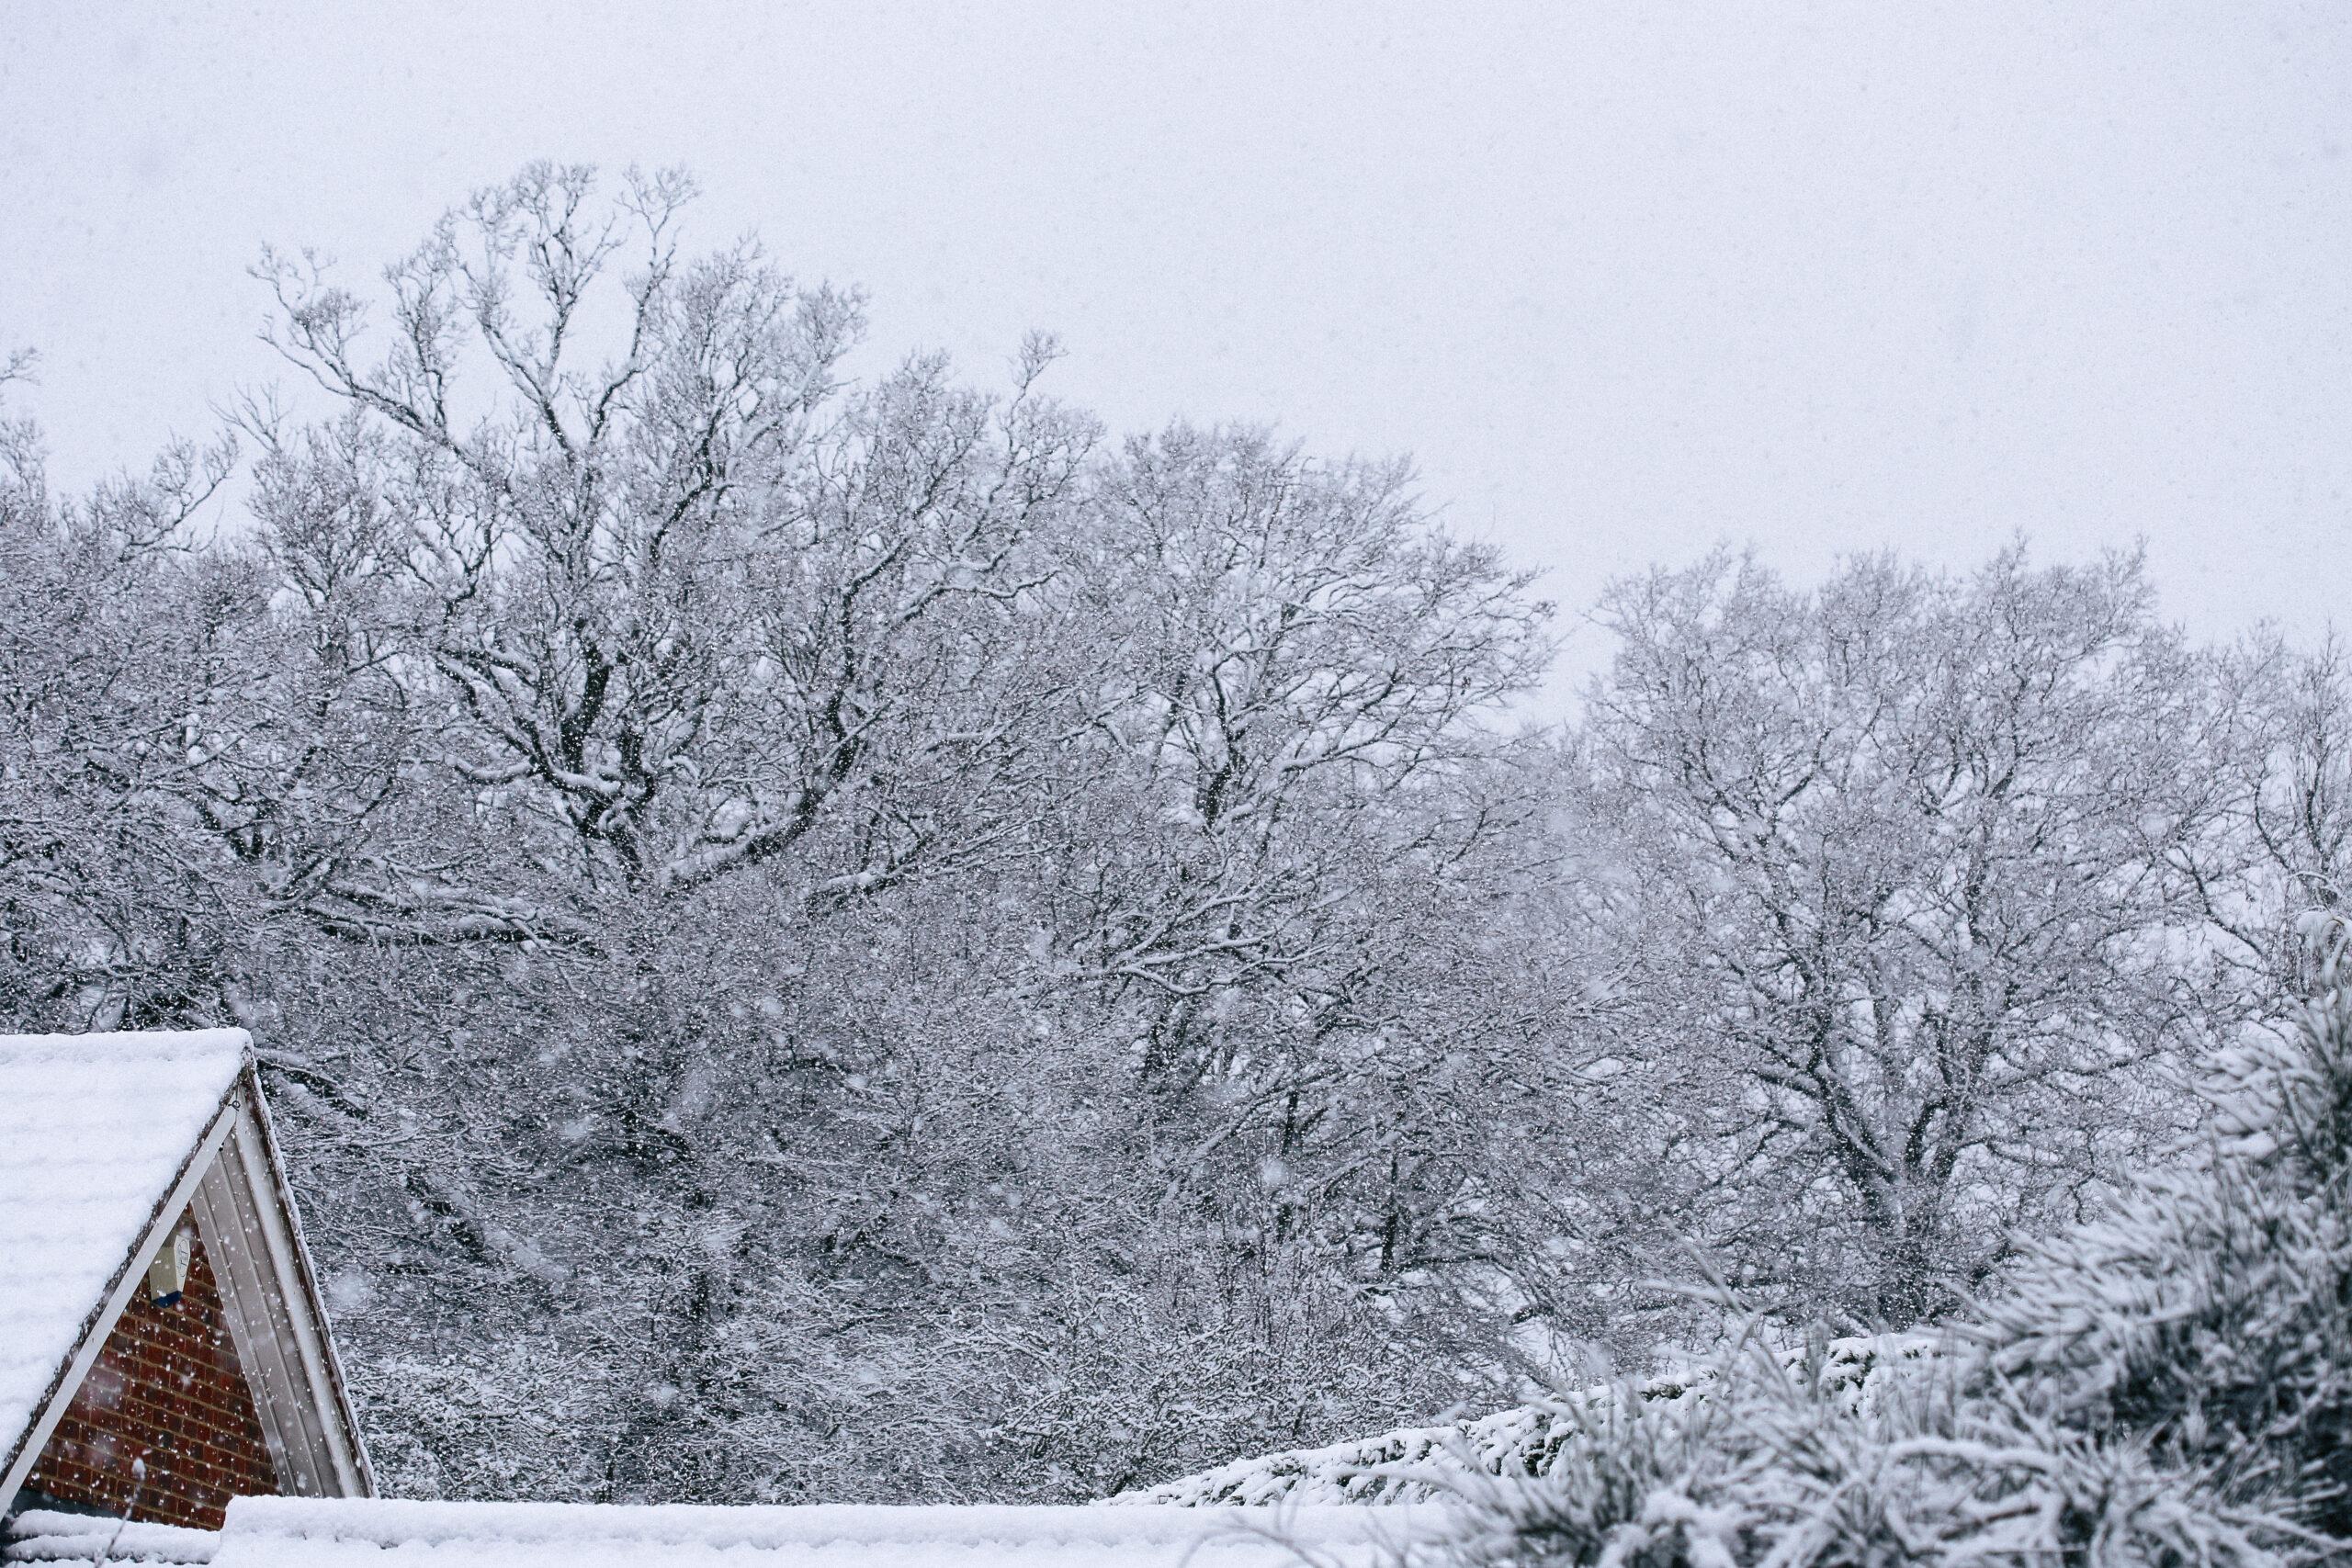 Breathtaking Snowy Day in England